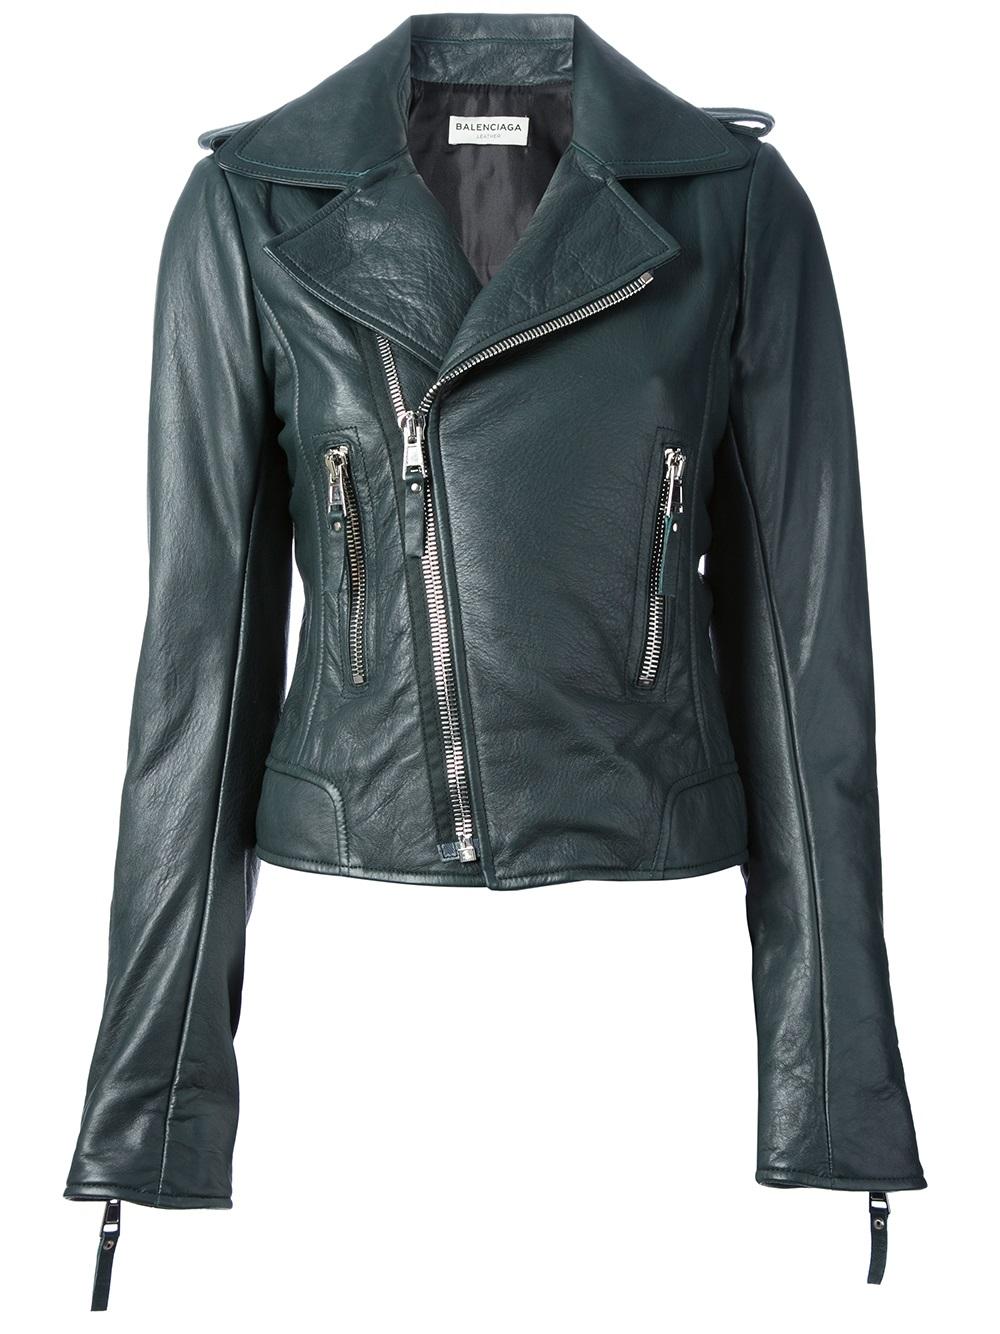 Balenciaga Leather Jacket In Green Lyst